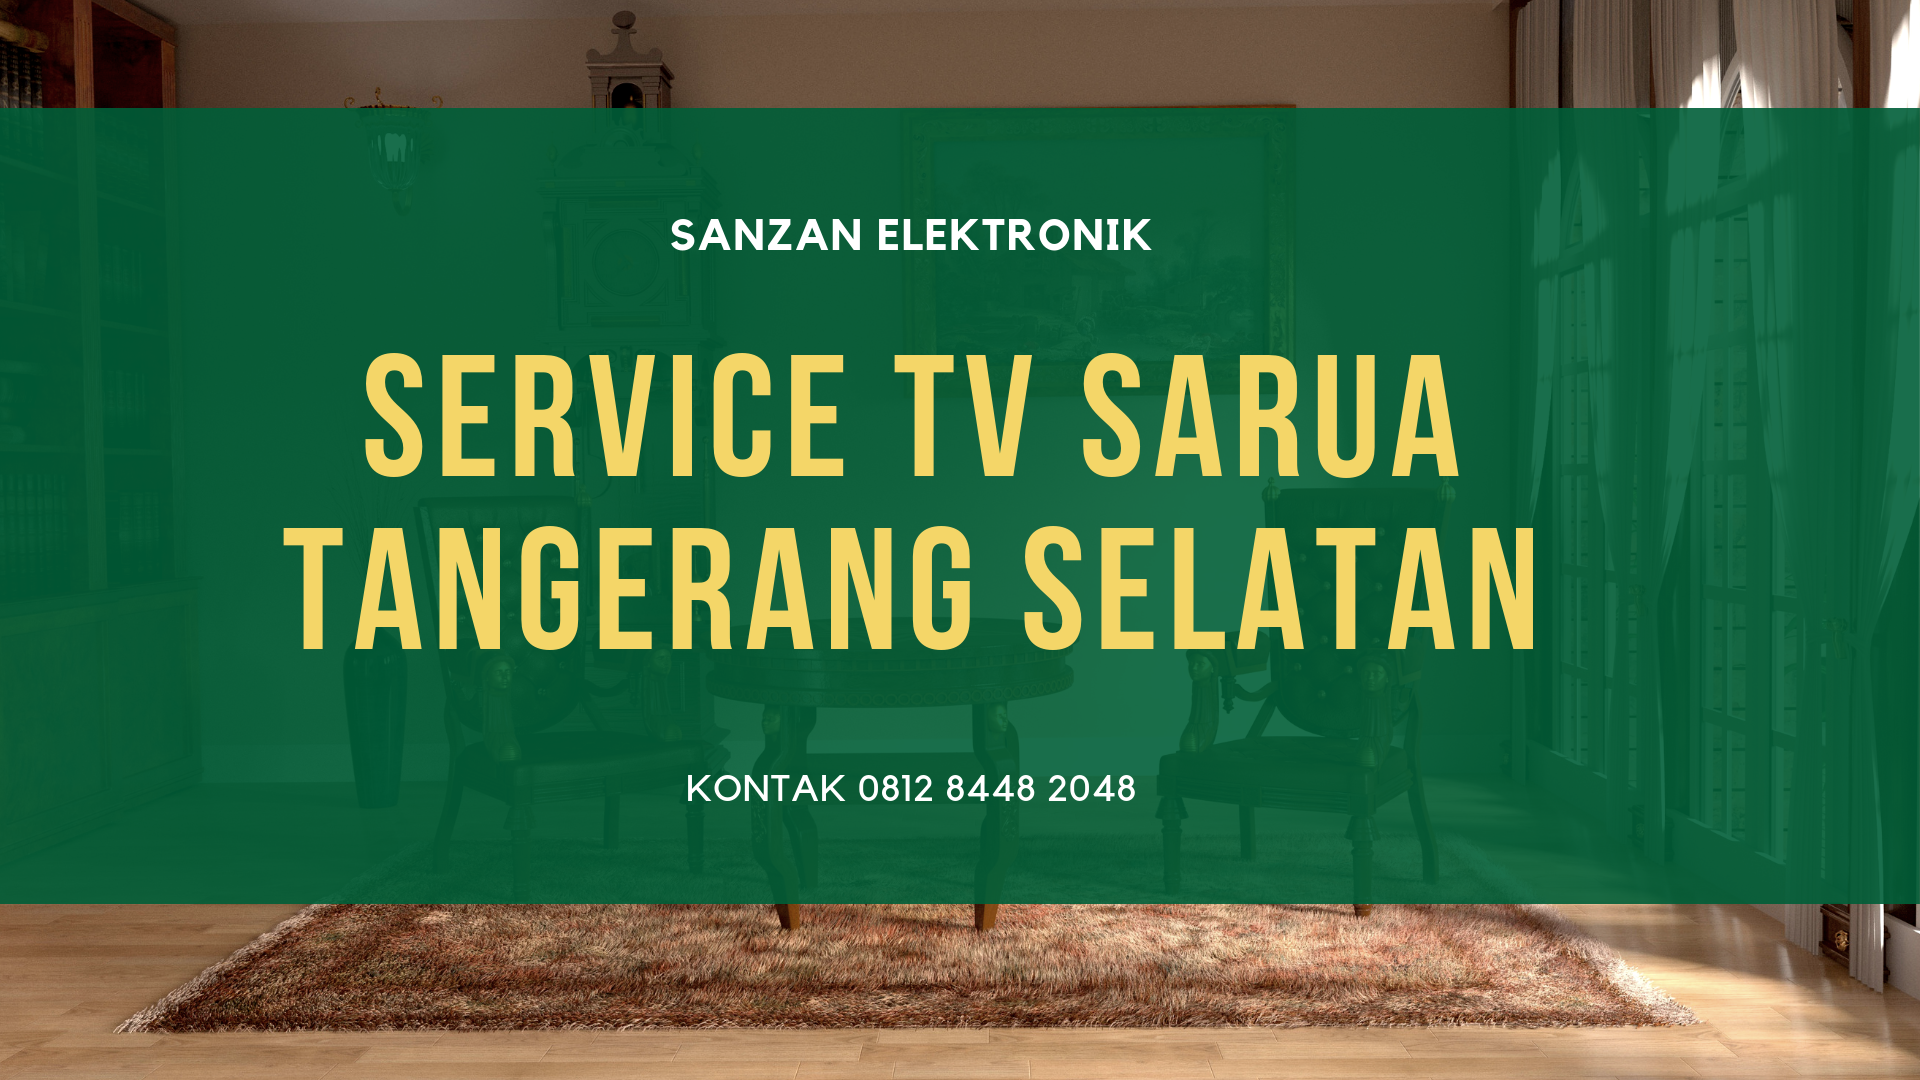 Service TV Sarua Tangerang Selatan